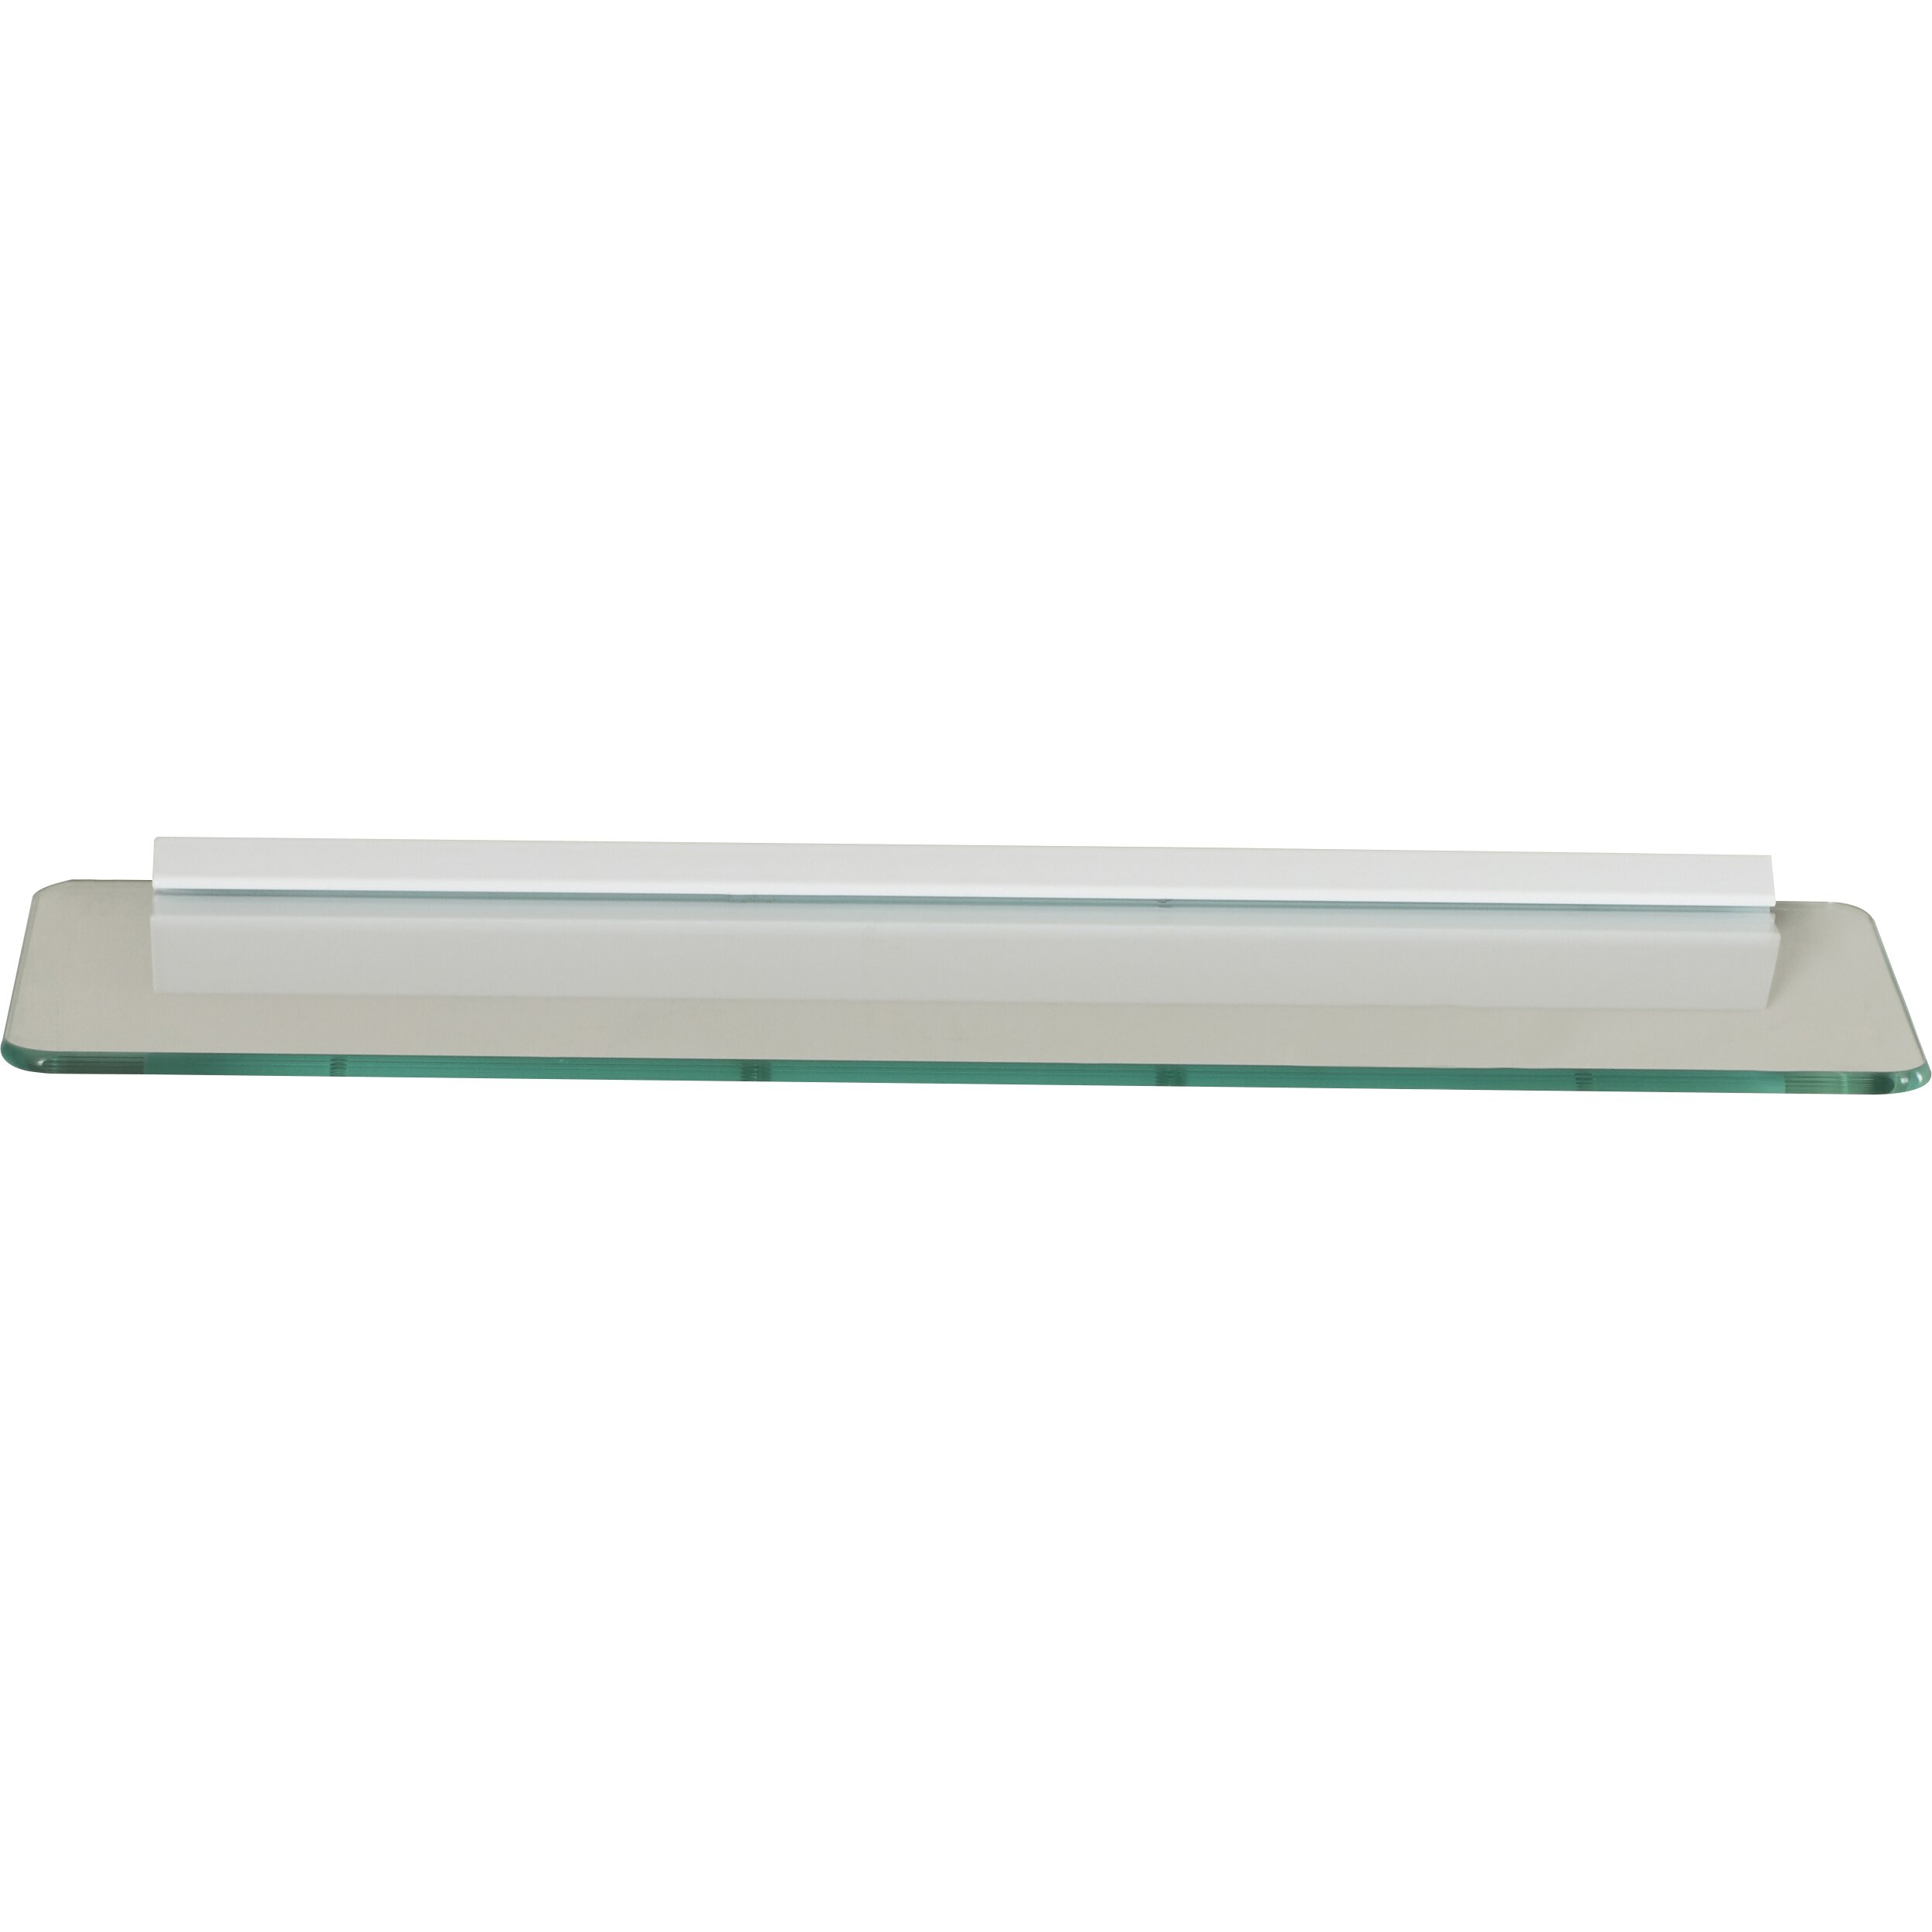 Glass Shelf In Bathroom Wade Logan Glass Floating Shelf